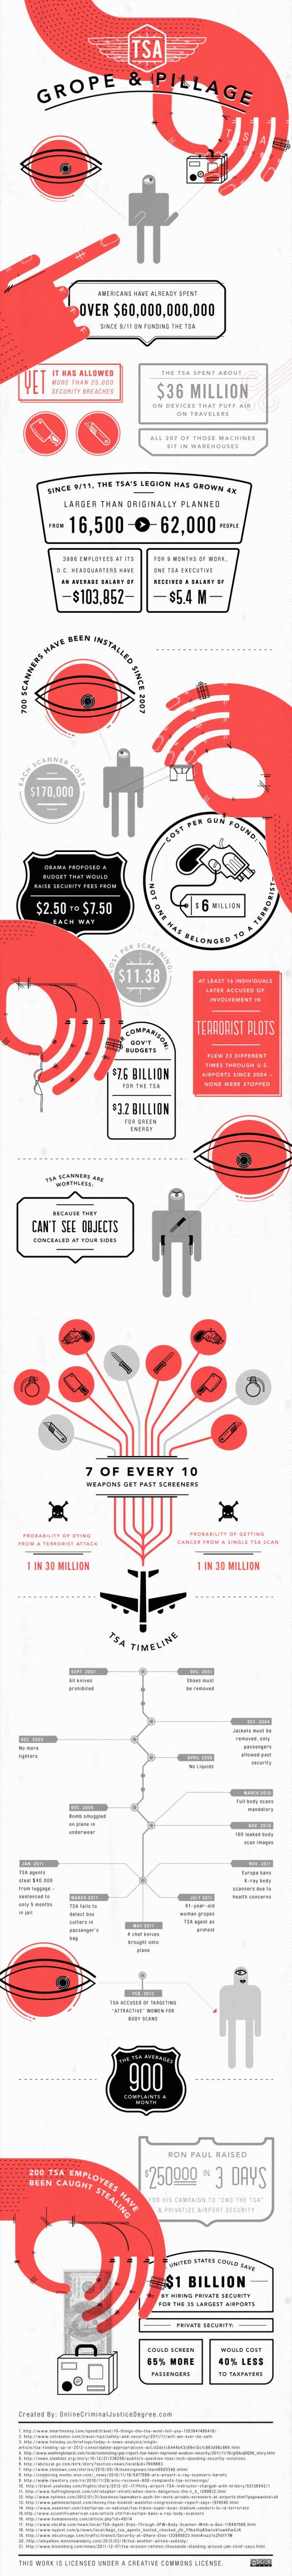 [TSA: Grope & Pillage [infographic]]